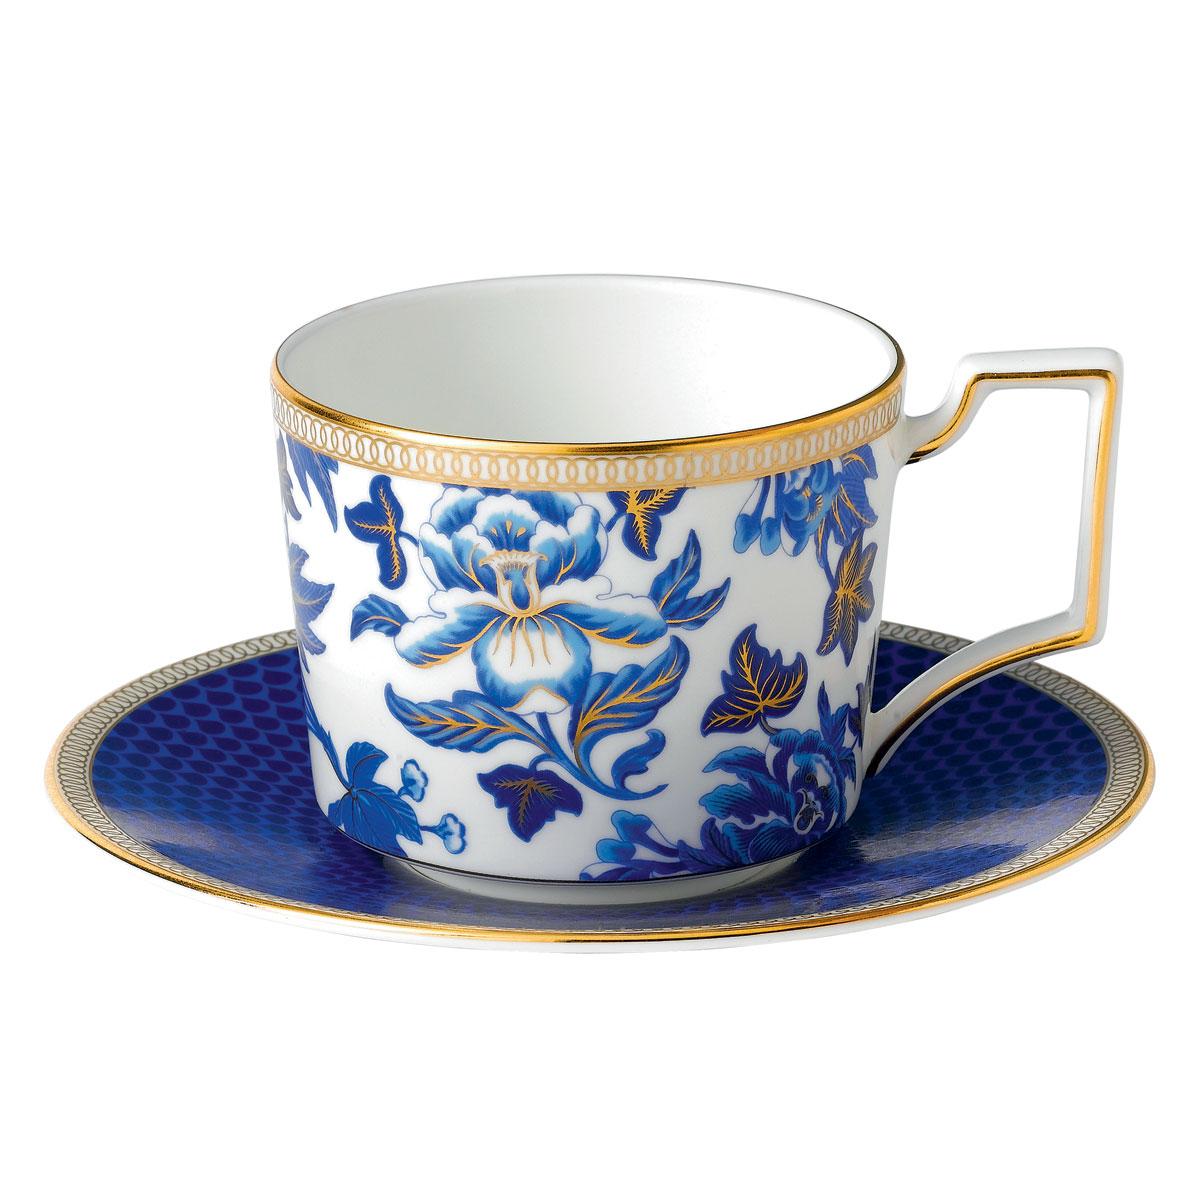 Wedgwood China Dinnerware Hibiscus Teacup and Saucer